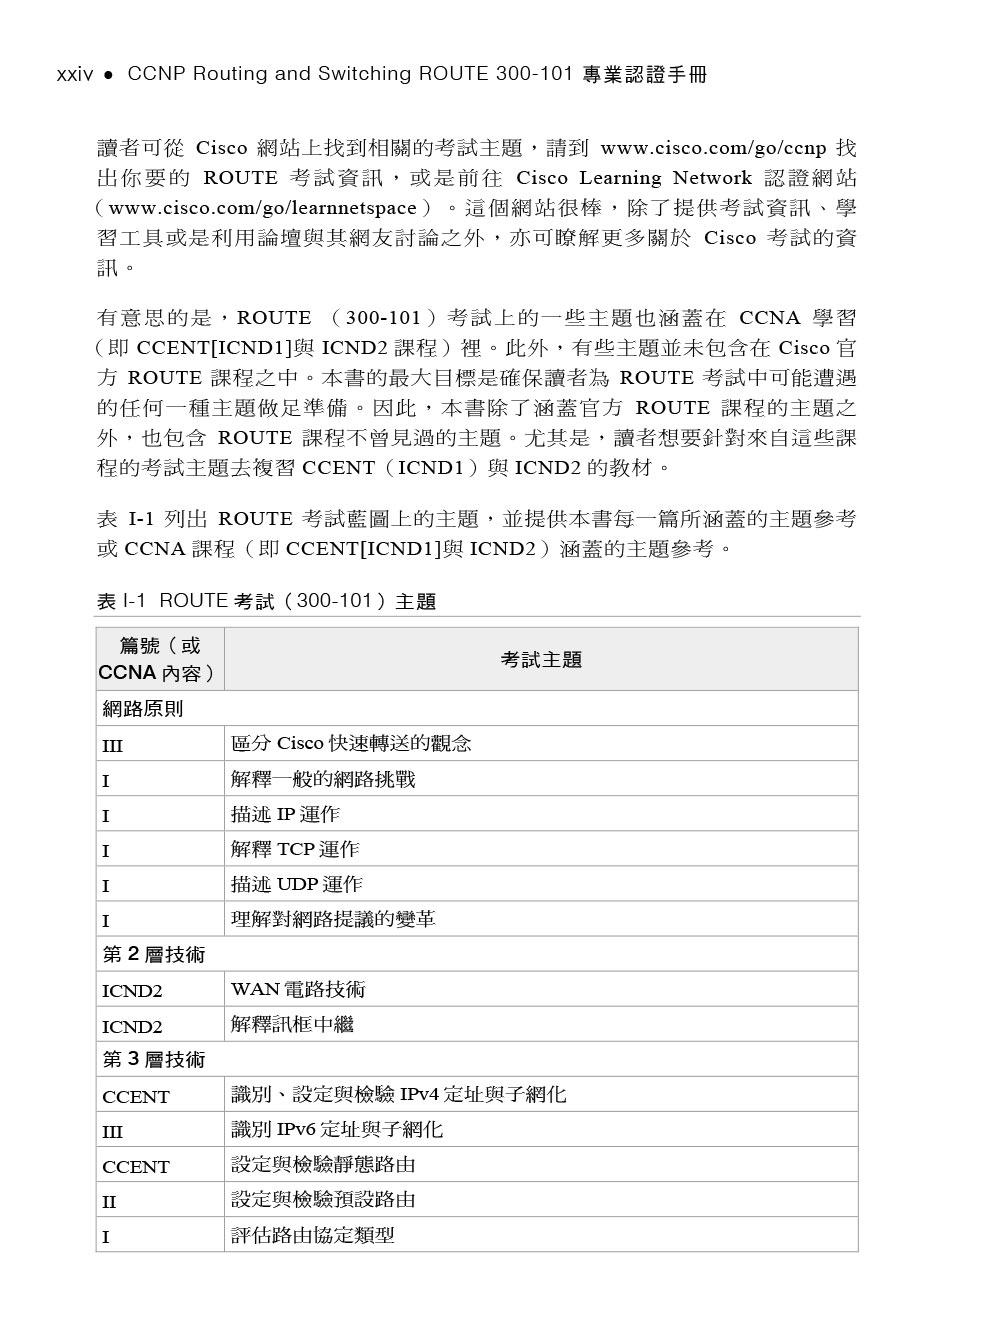 ◤博客來BOOKS◢ 暢銷書榜《推薦》CCNP Routing and Switching ROUTE 300-101專業認證手冊(附DVD一片)